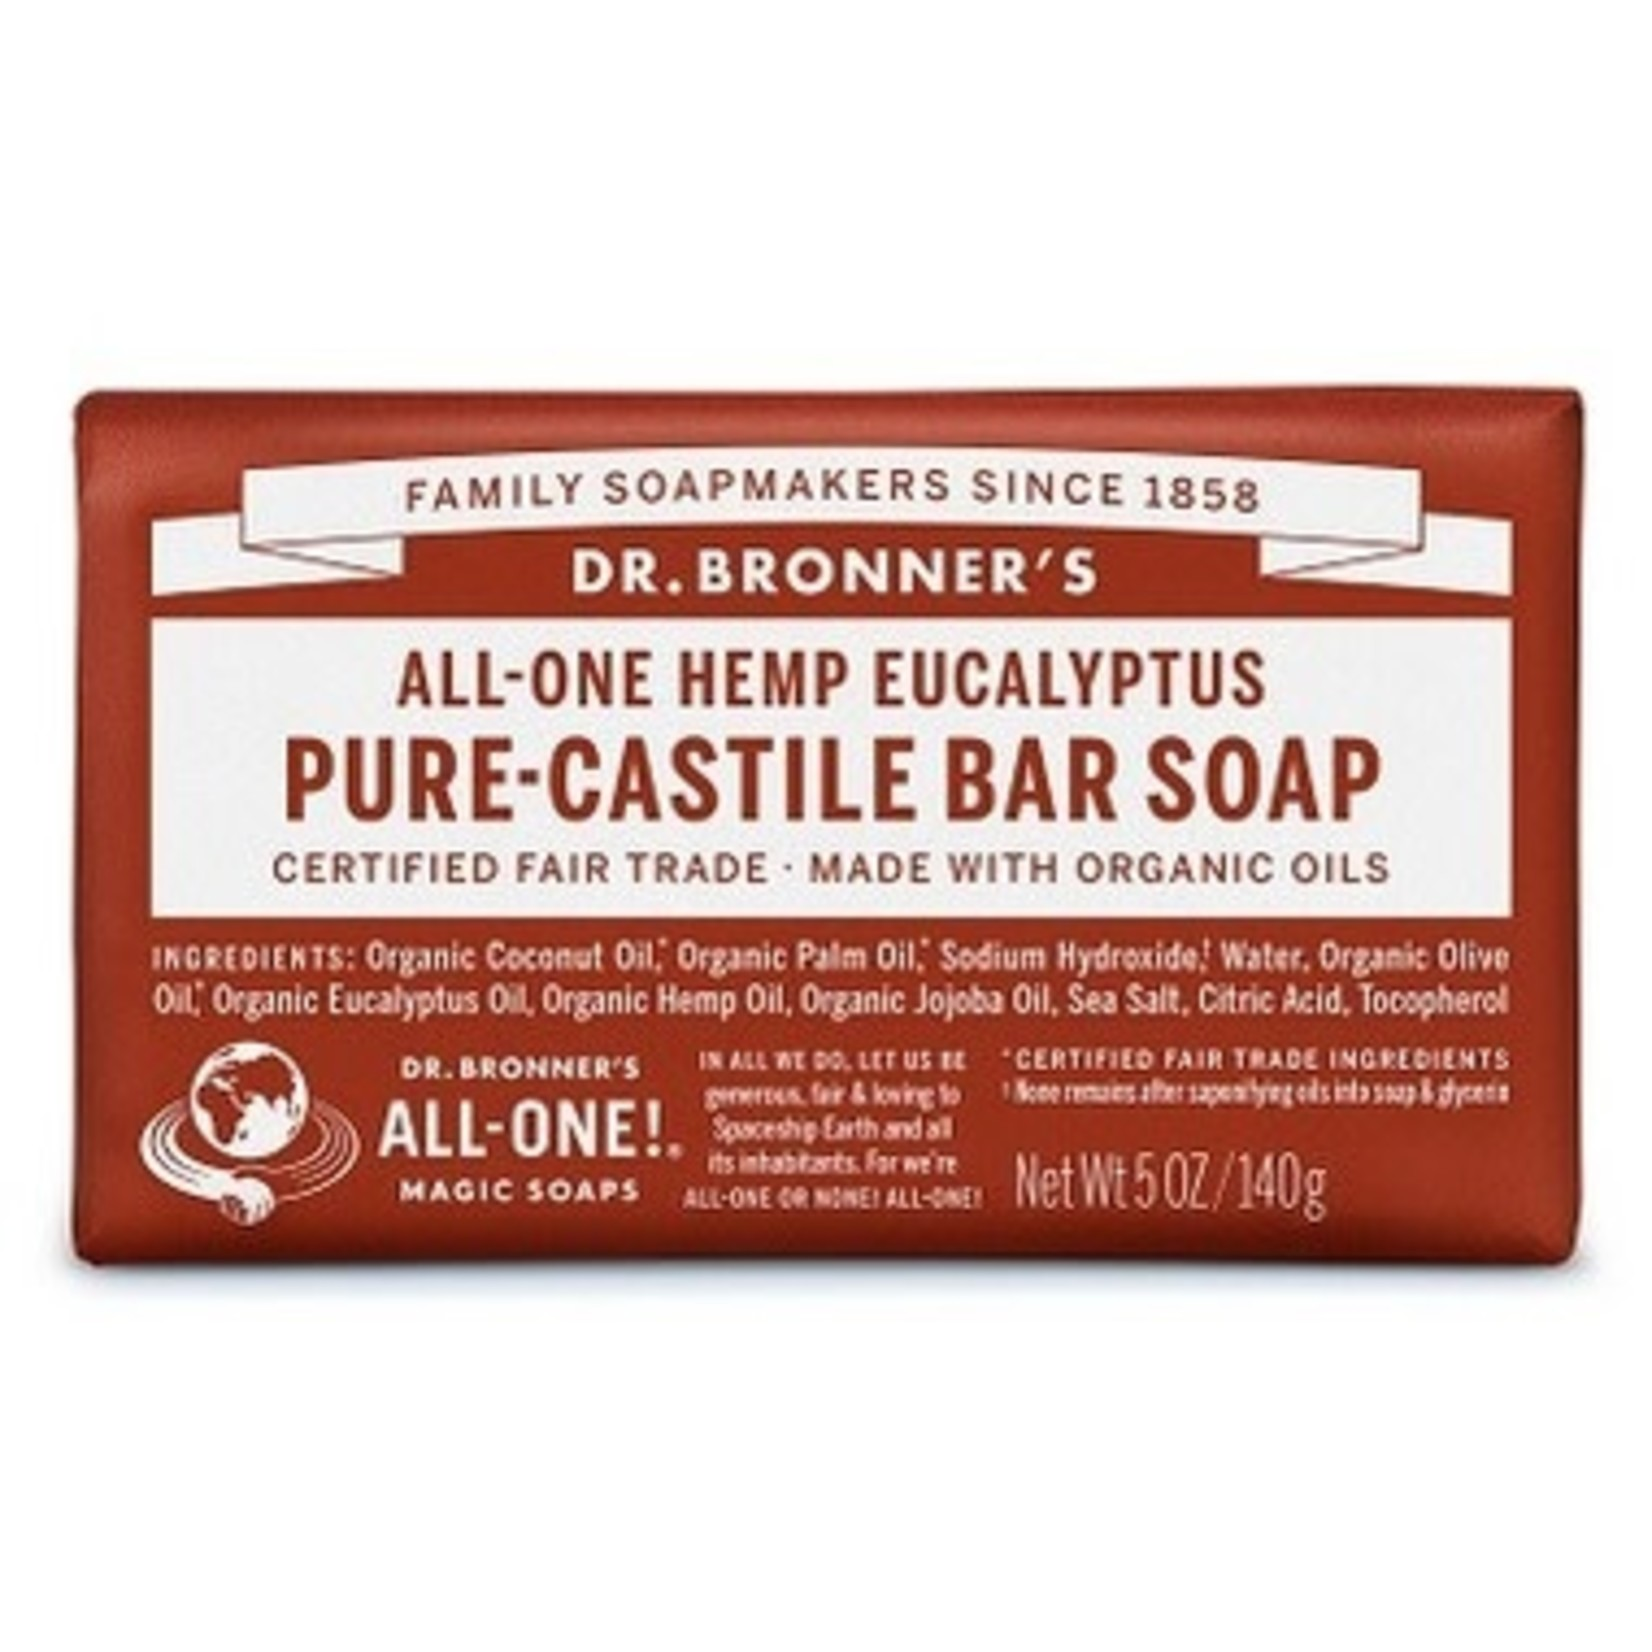 DR. BRONNER'S EUCALYPTUS PURE-CASTILE BAR SOAP